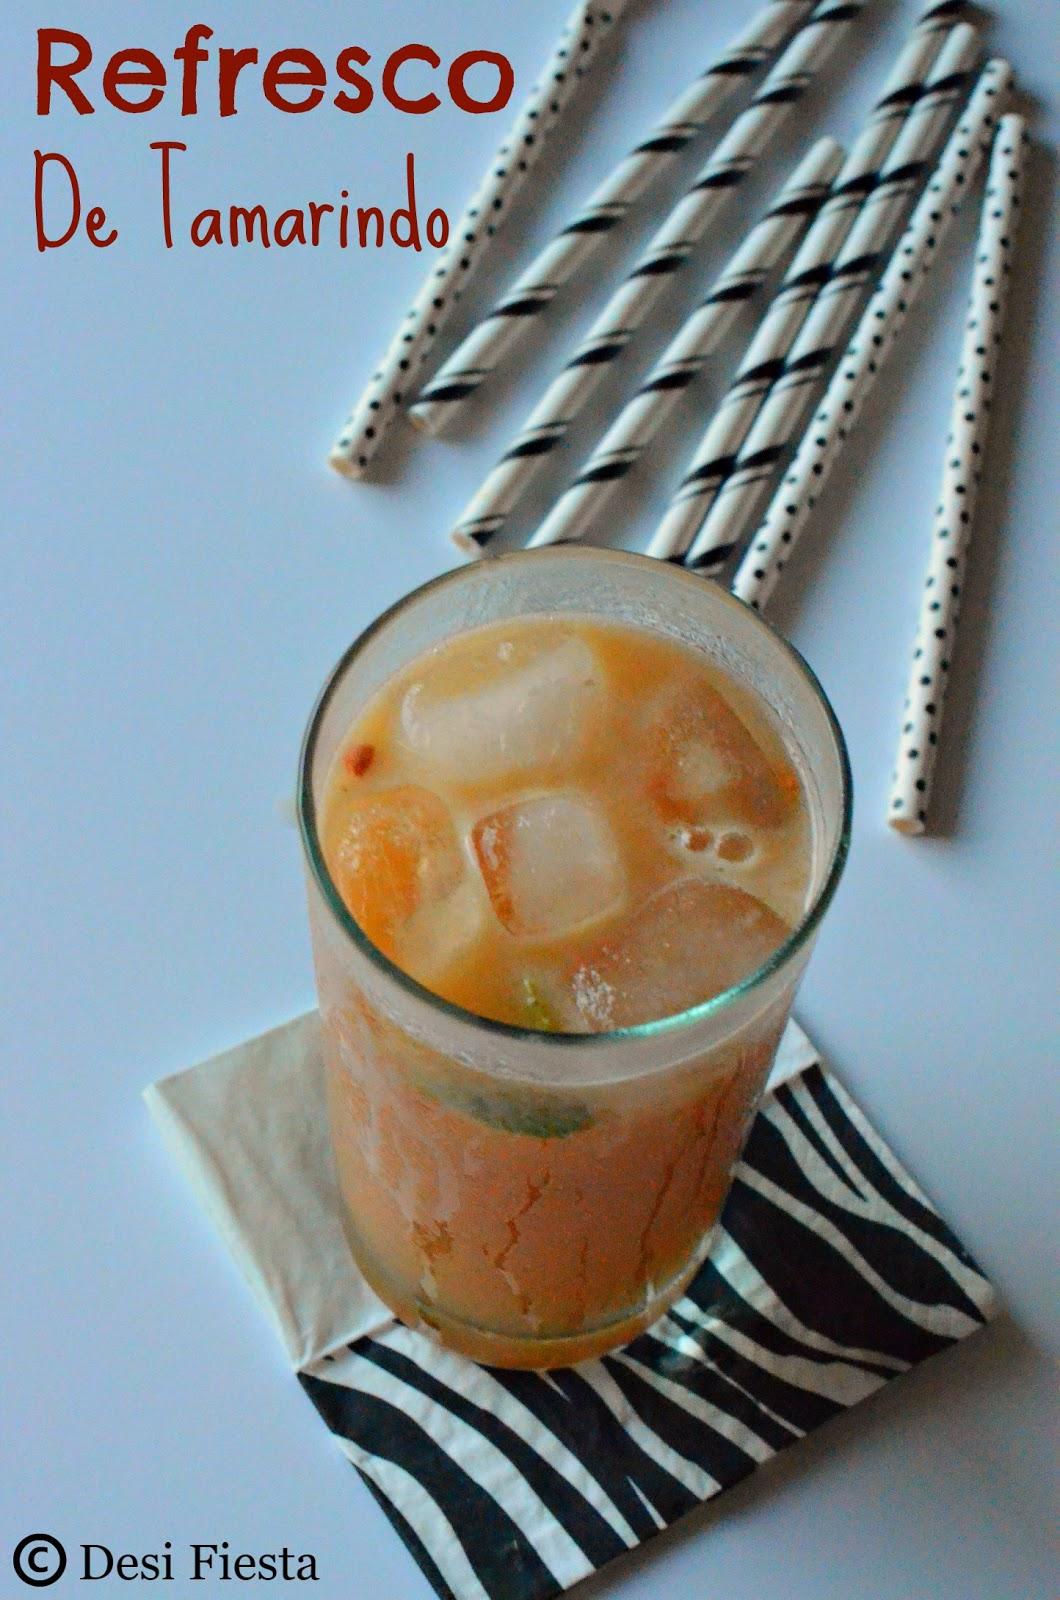 Puerto rican Tamarind juice